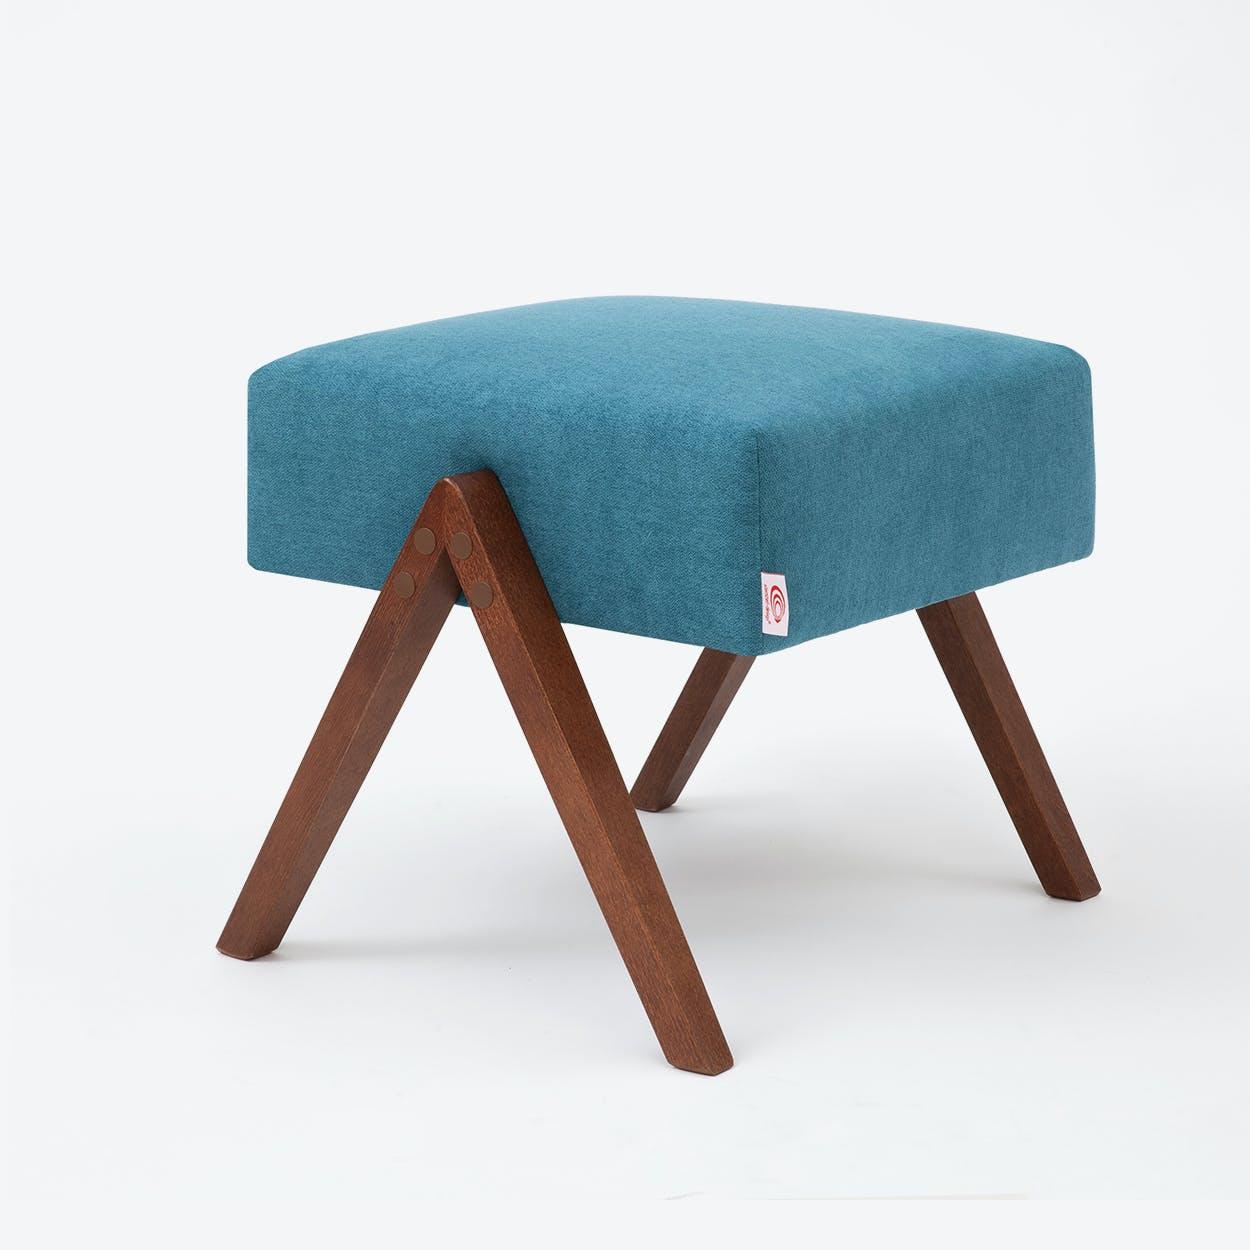 Retrostar Footstool - Basic-Line in Turquoise